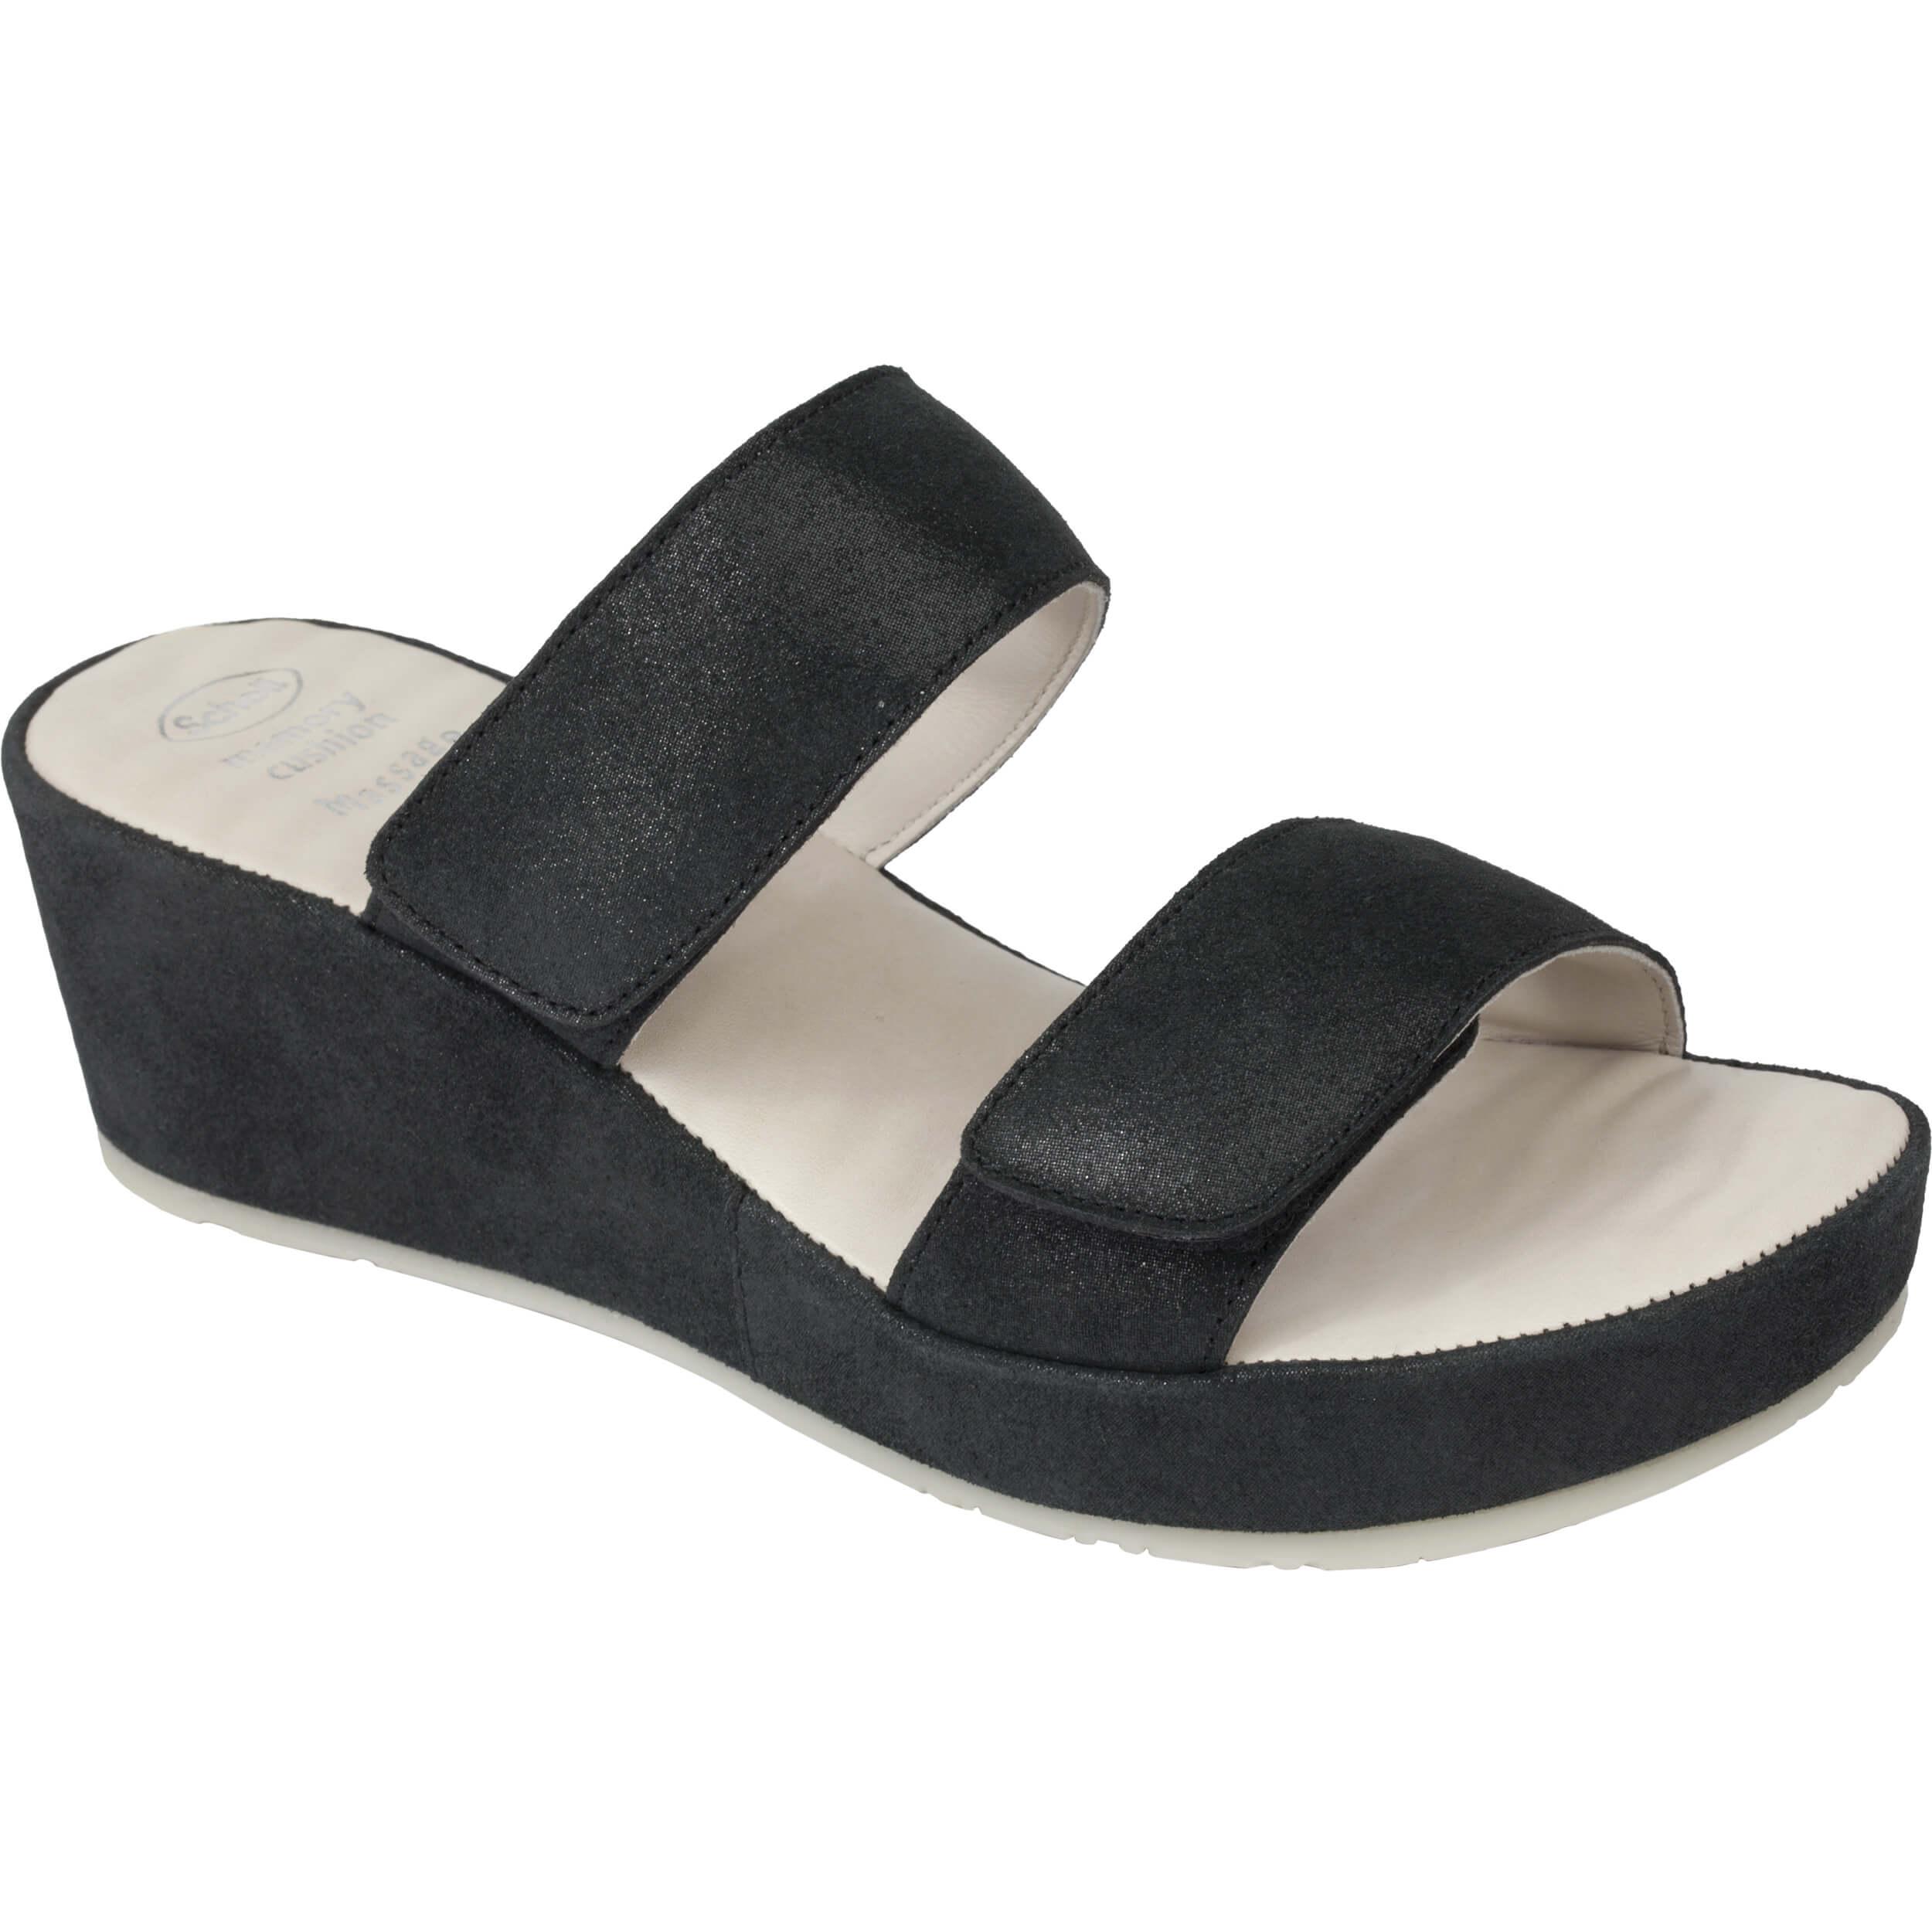 fdfb4171112 Dr Scholl Shoes Cora Μαύρο ΝΕΟ Γυναικεία Ανατομικά Παπούτσια ...